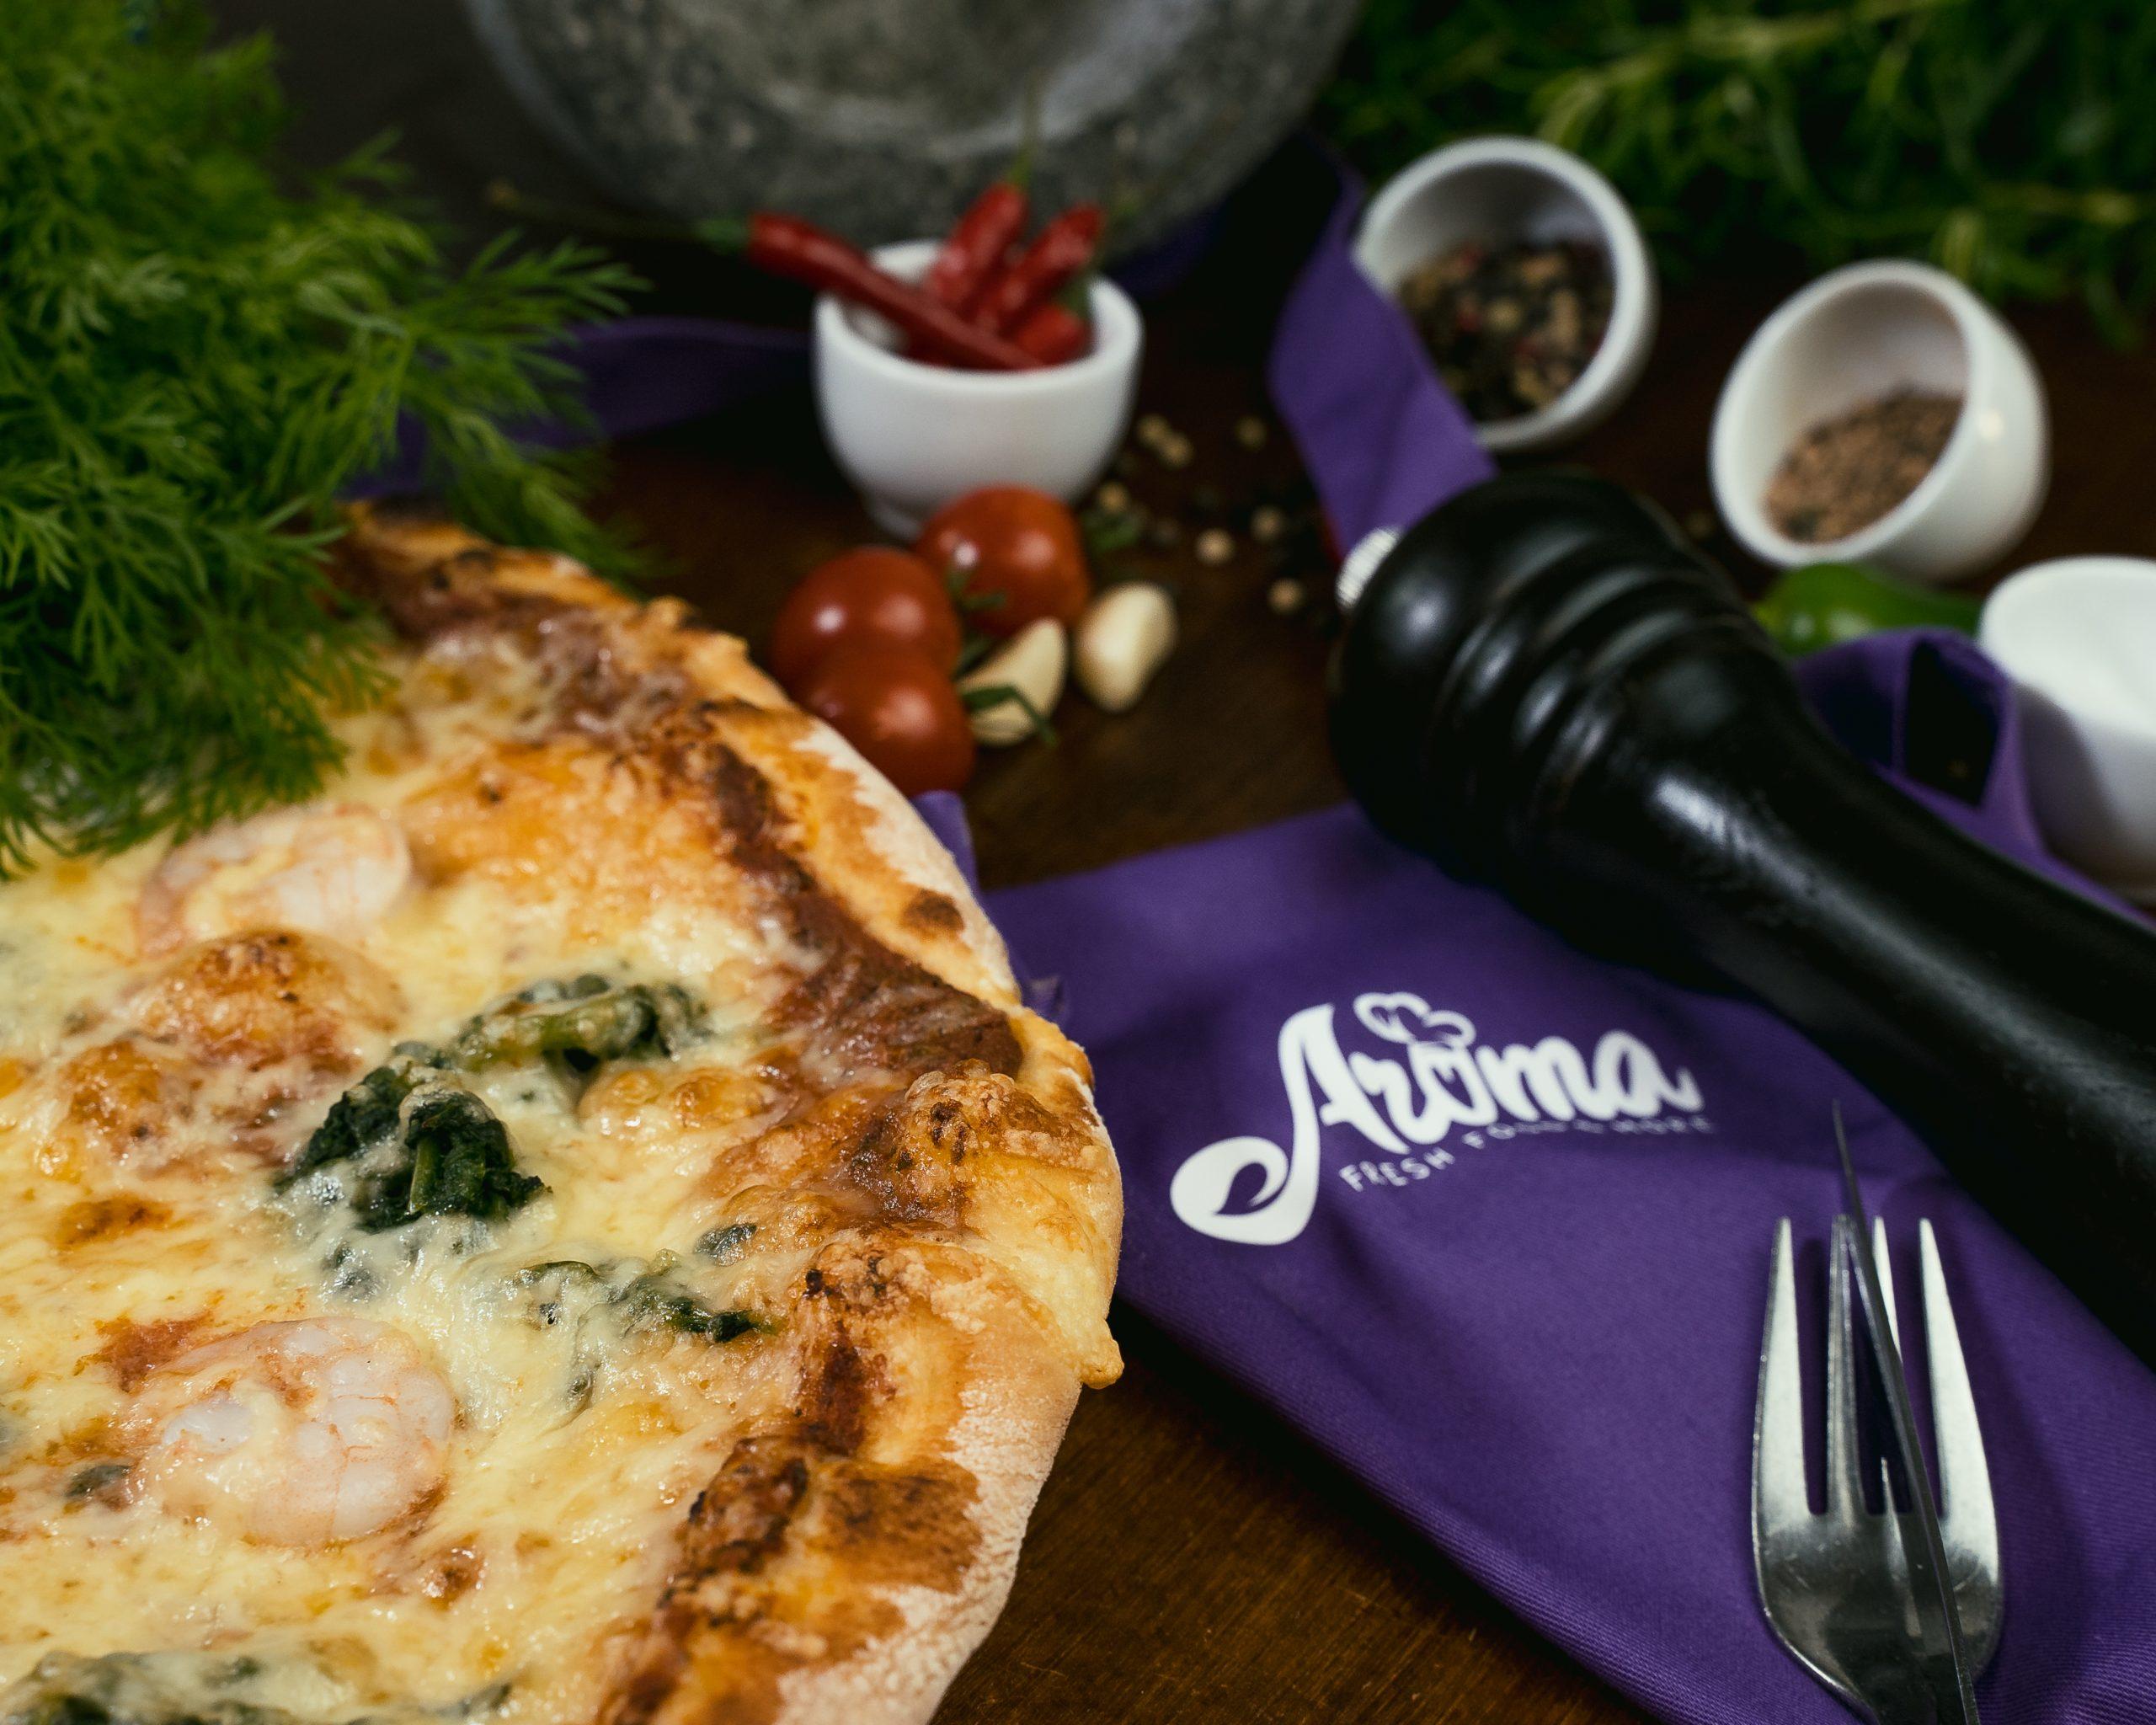 foodfotografie siegen, pizzeria aroma, pizzafoto